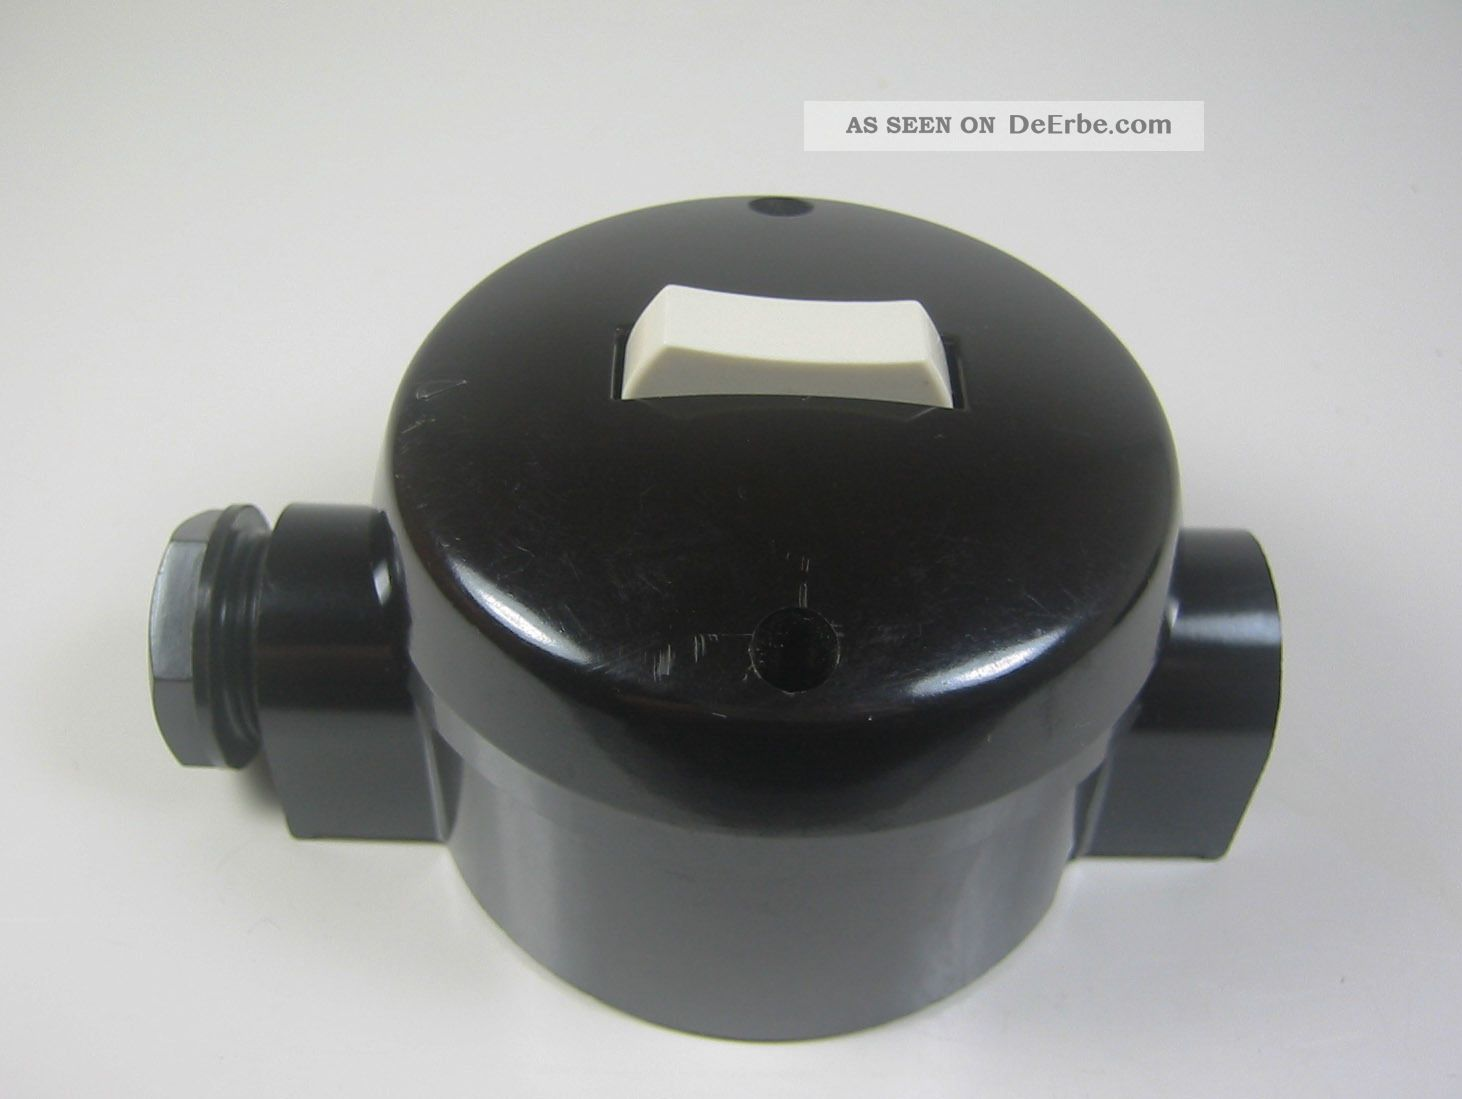 2 Schalter Bakelit Verteilerdose Drehschalter